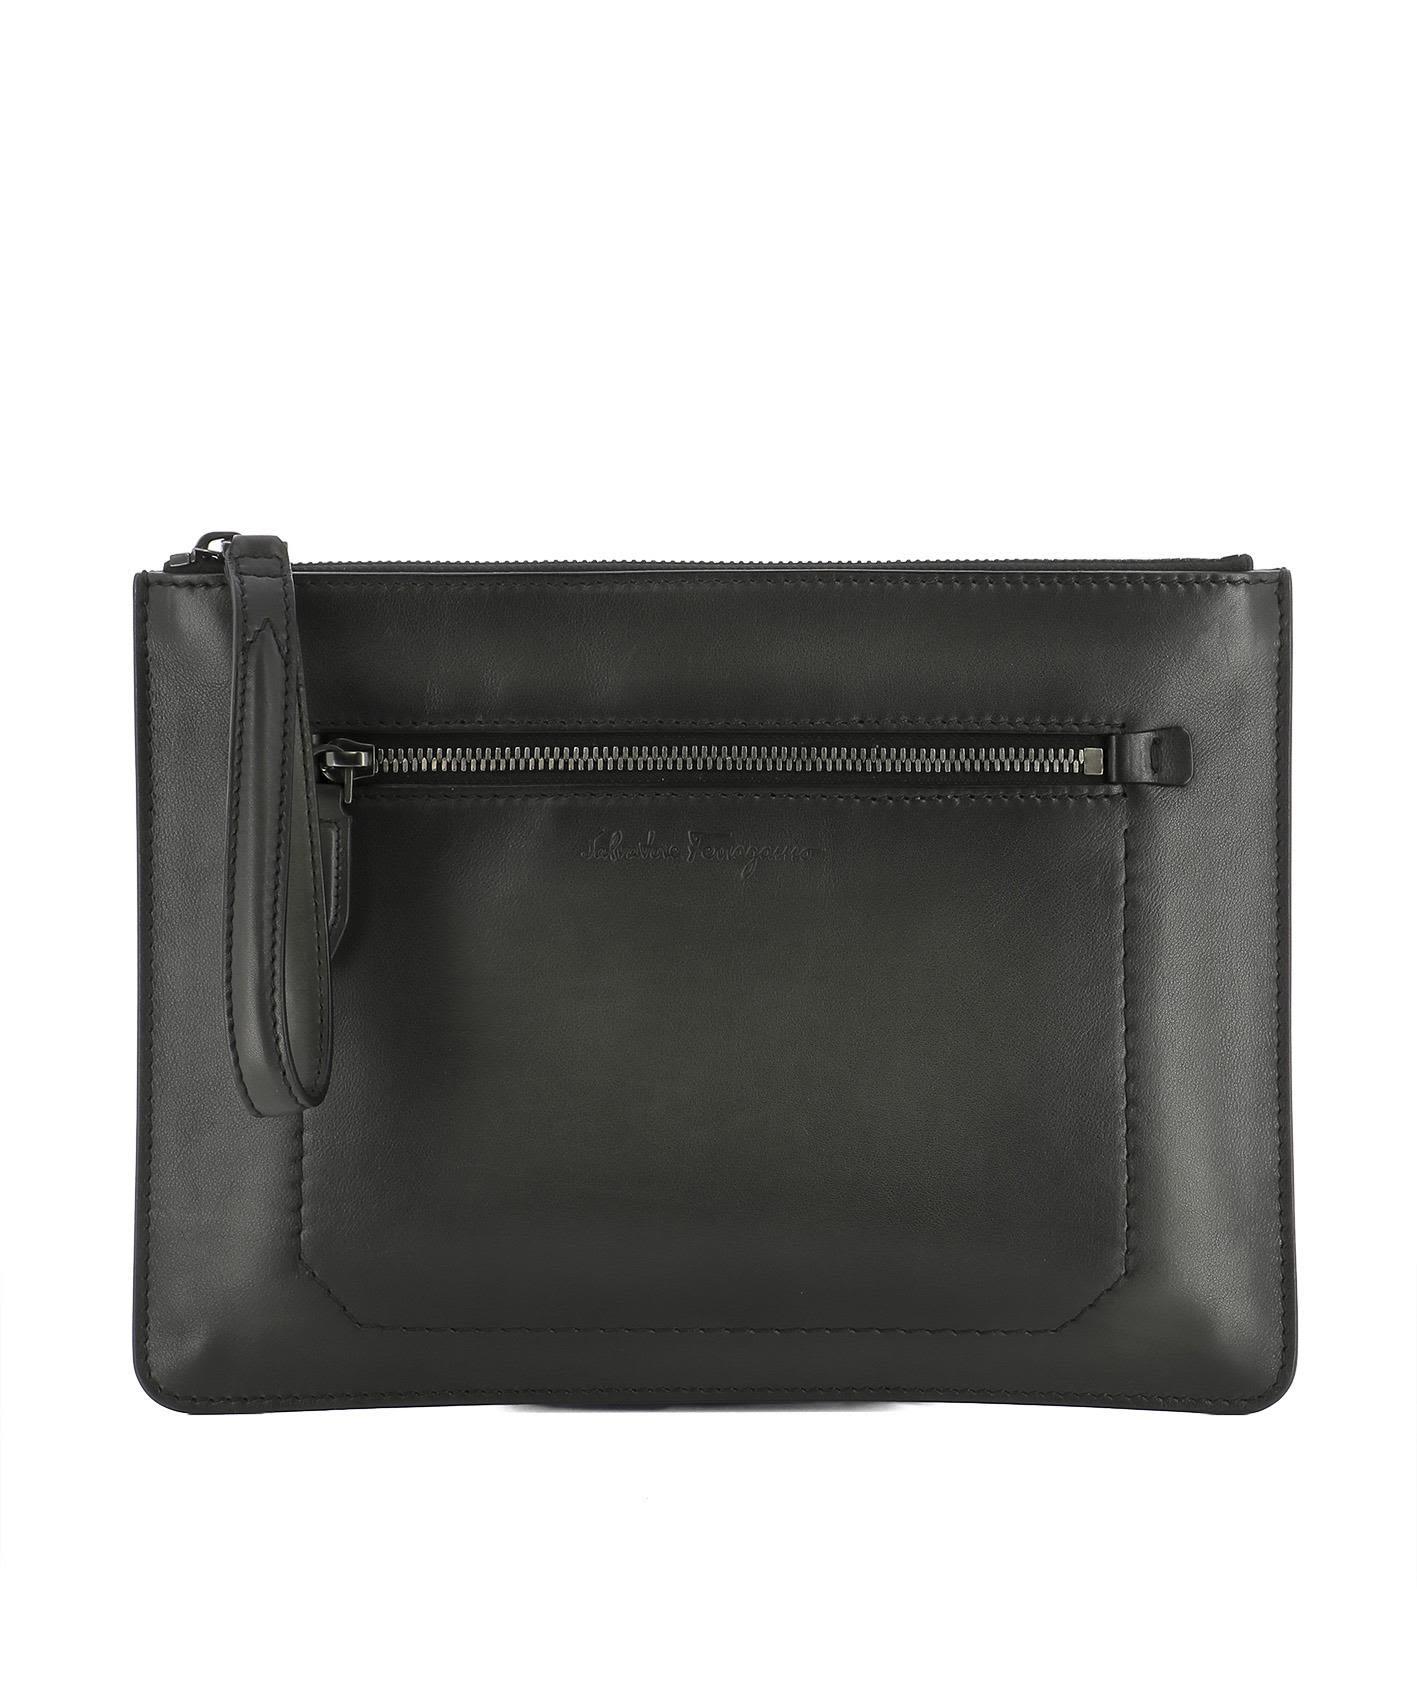 Black Leather Pochette